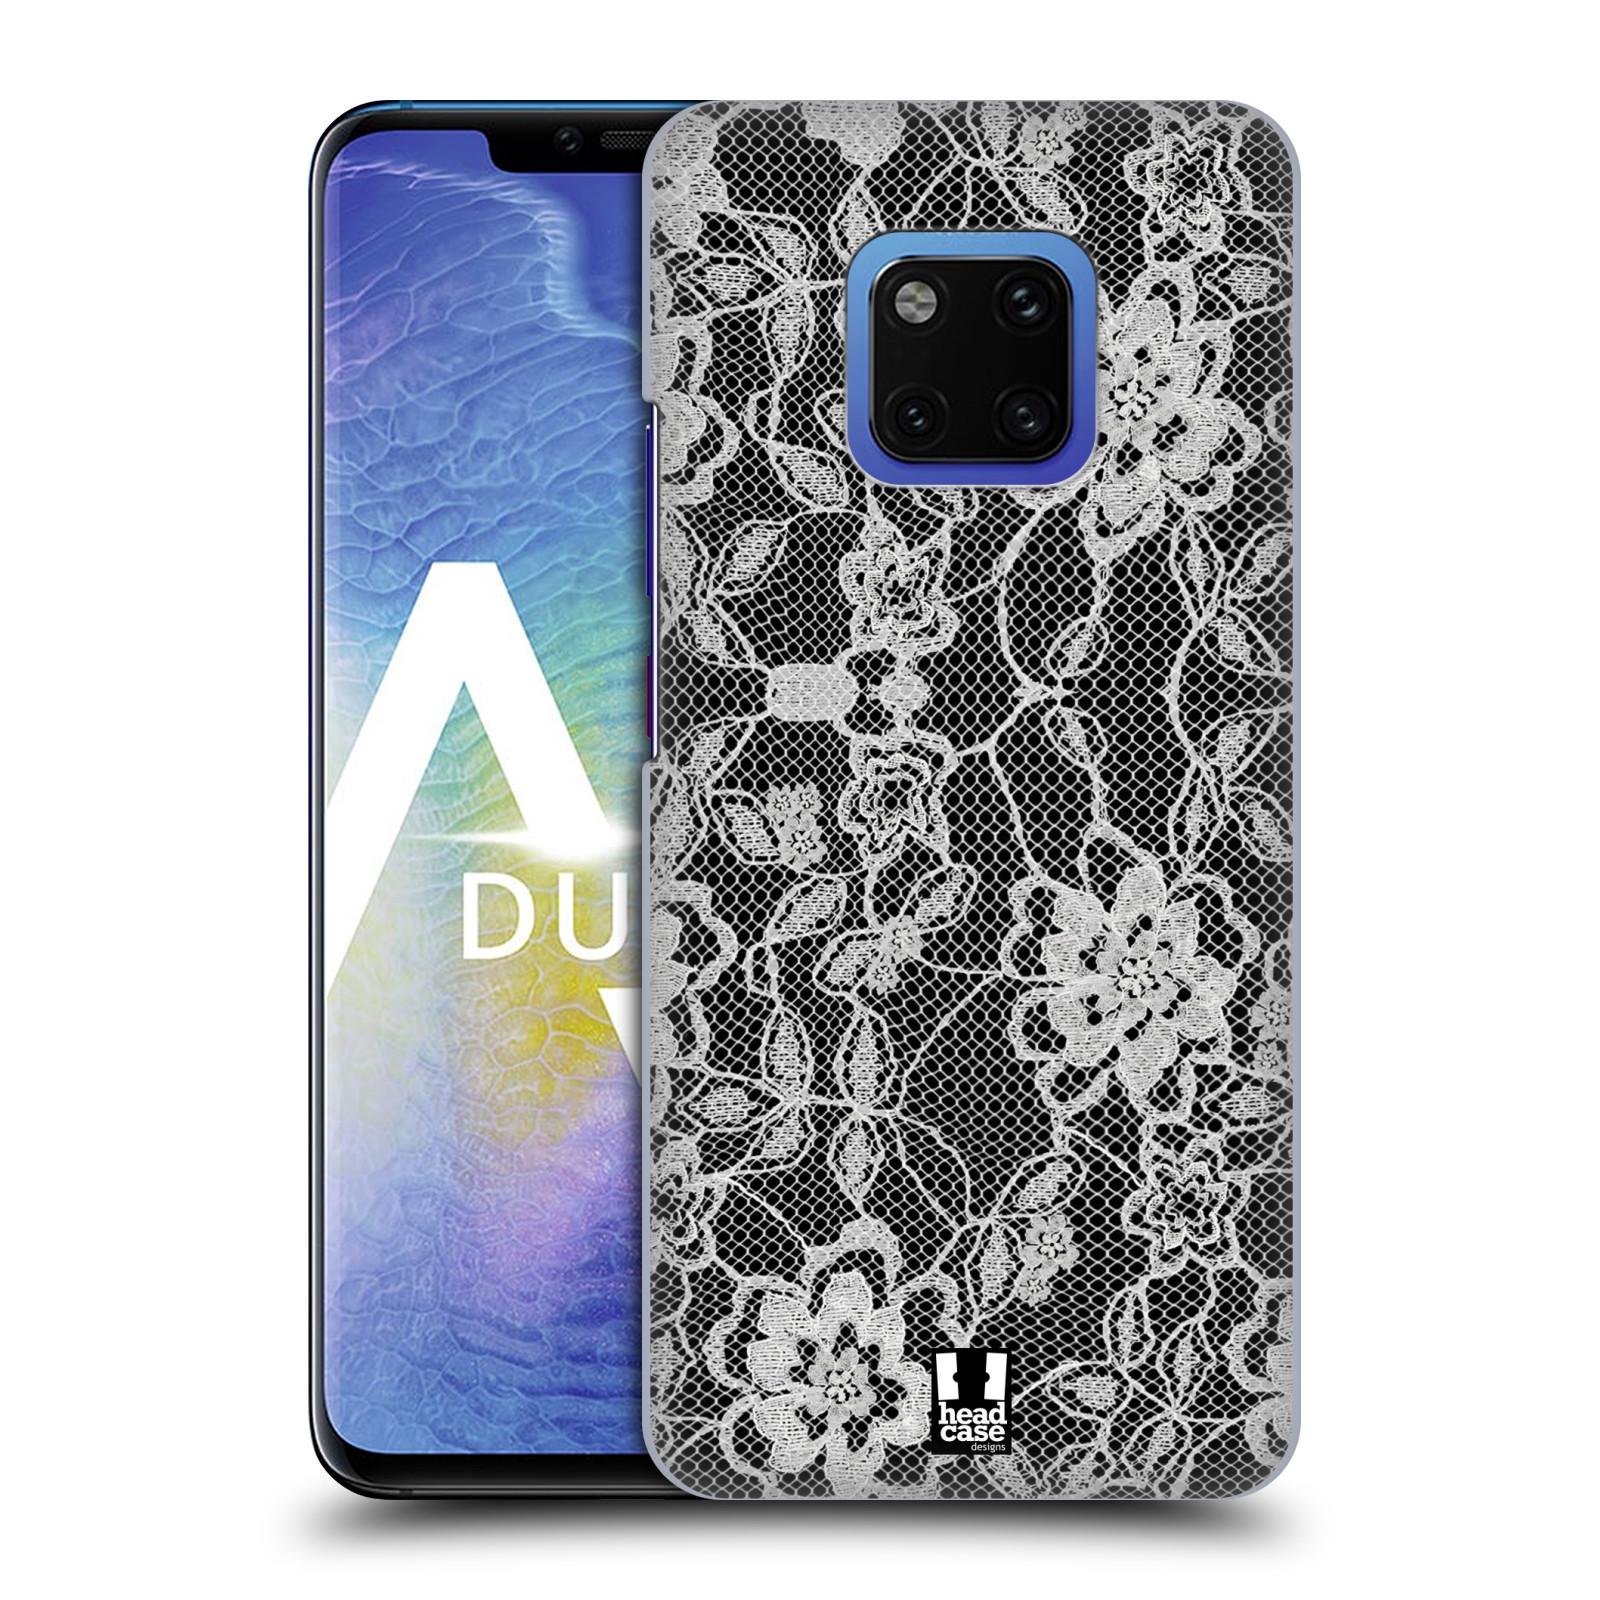 Plastové pouzdro na mobil Huawei Mate 20 Pro - Head Case - FLOWERY KRAJKA